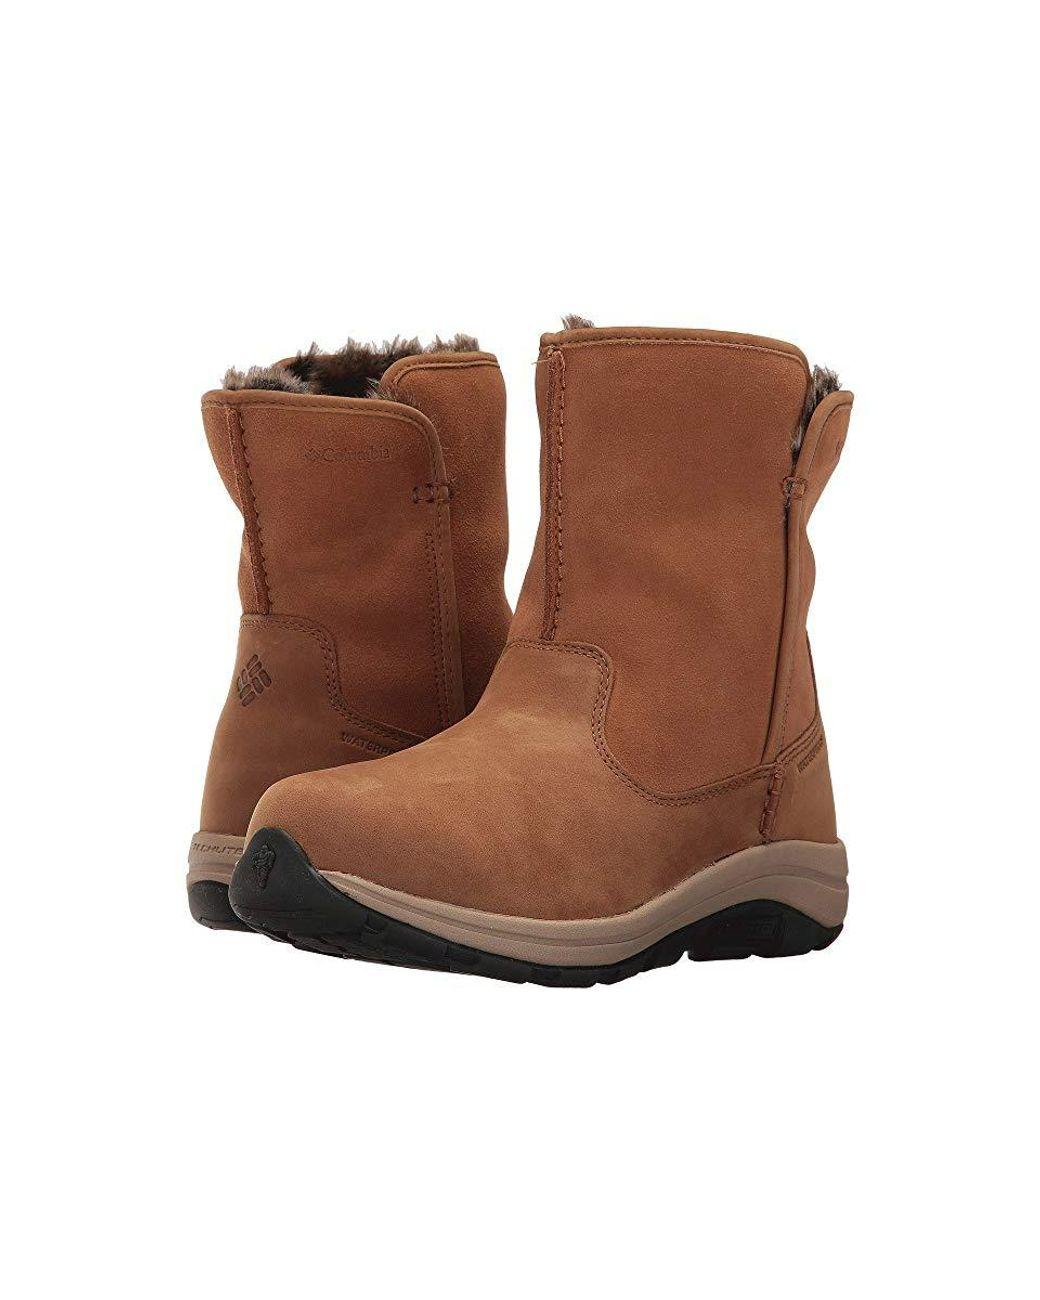 e0f8492d8f Columbia Bangor Slip Omni-heat (elk/oxford Tan) Shoes in Brown ...